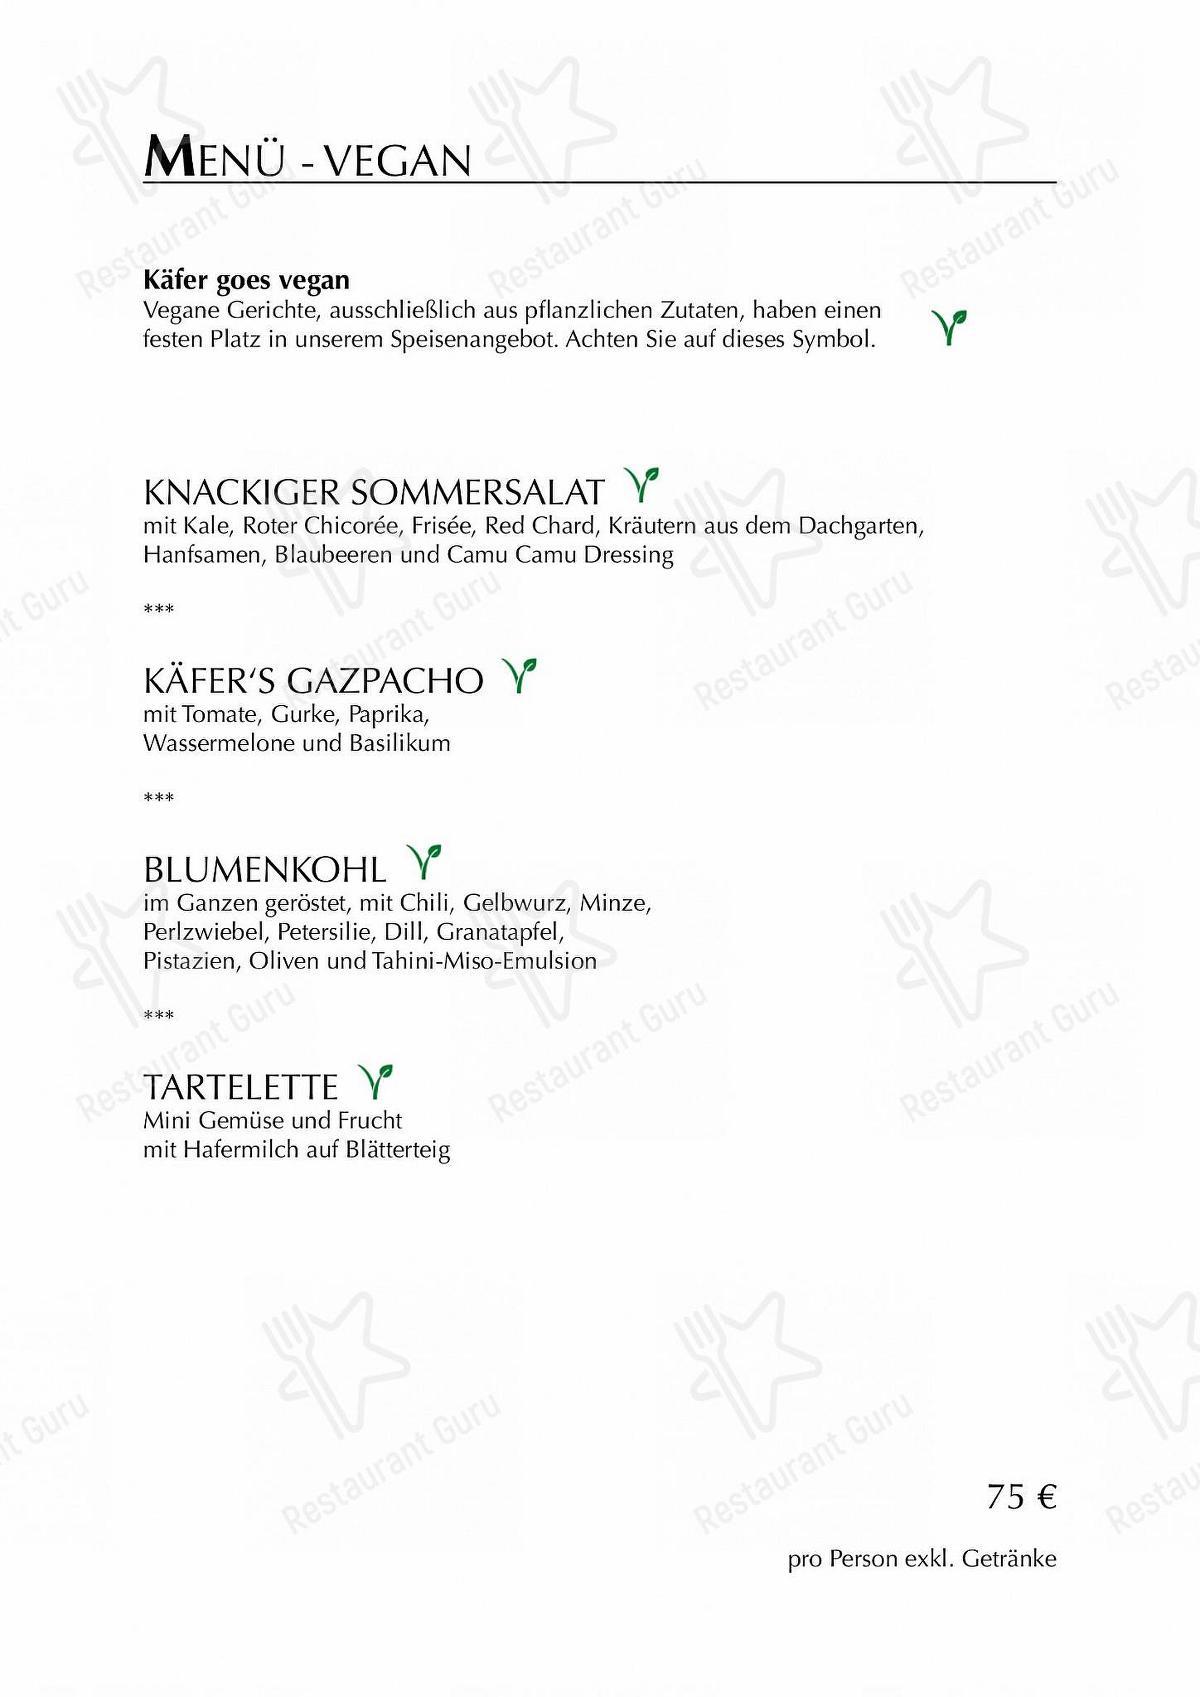 Käfer-Schänke Speisekarte - Restaurant Speisekarte